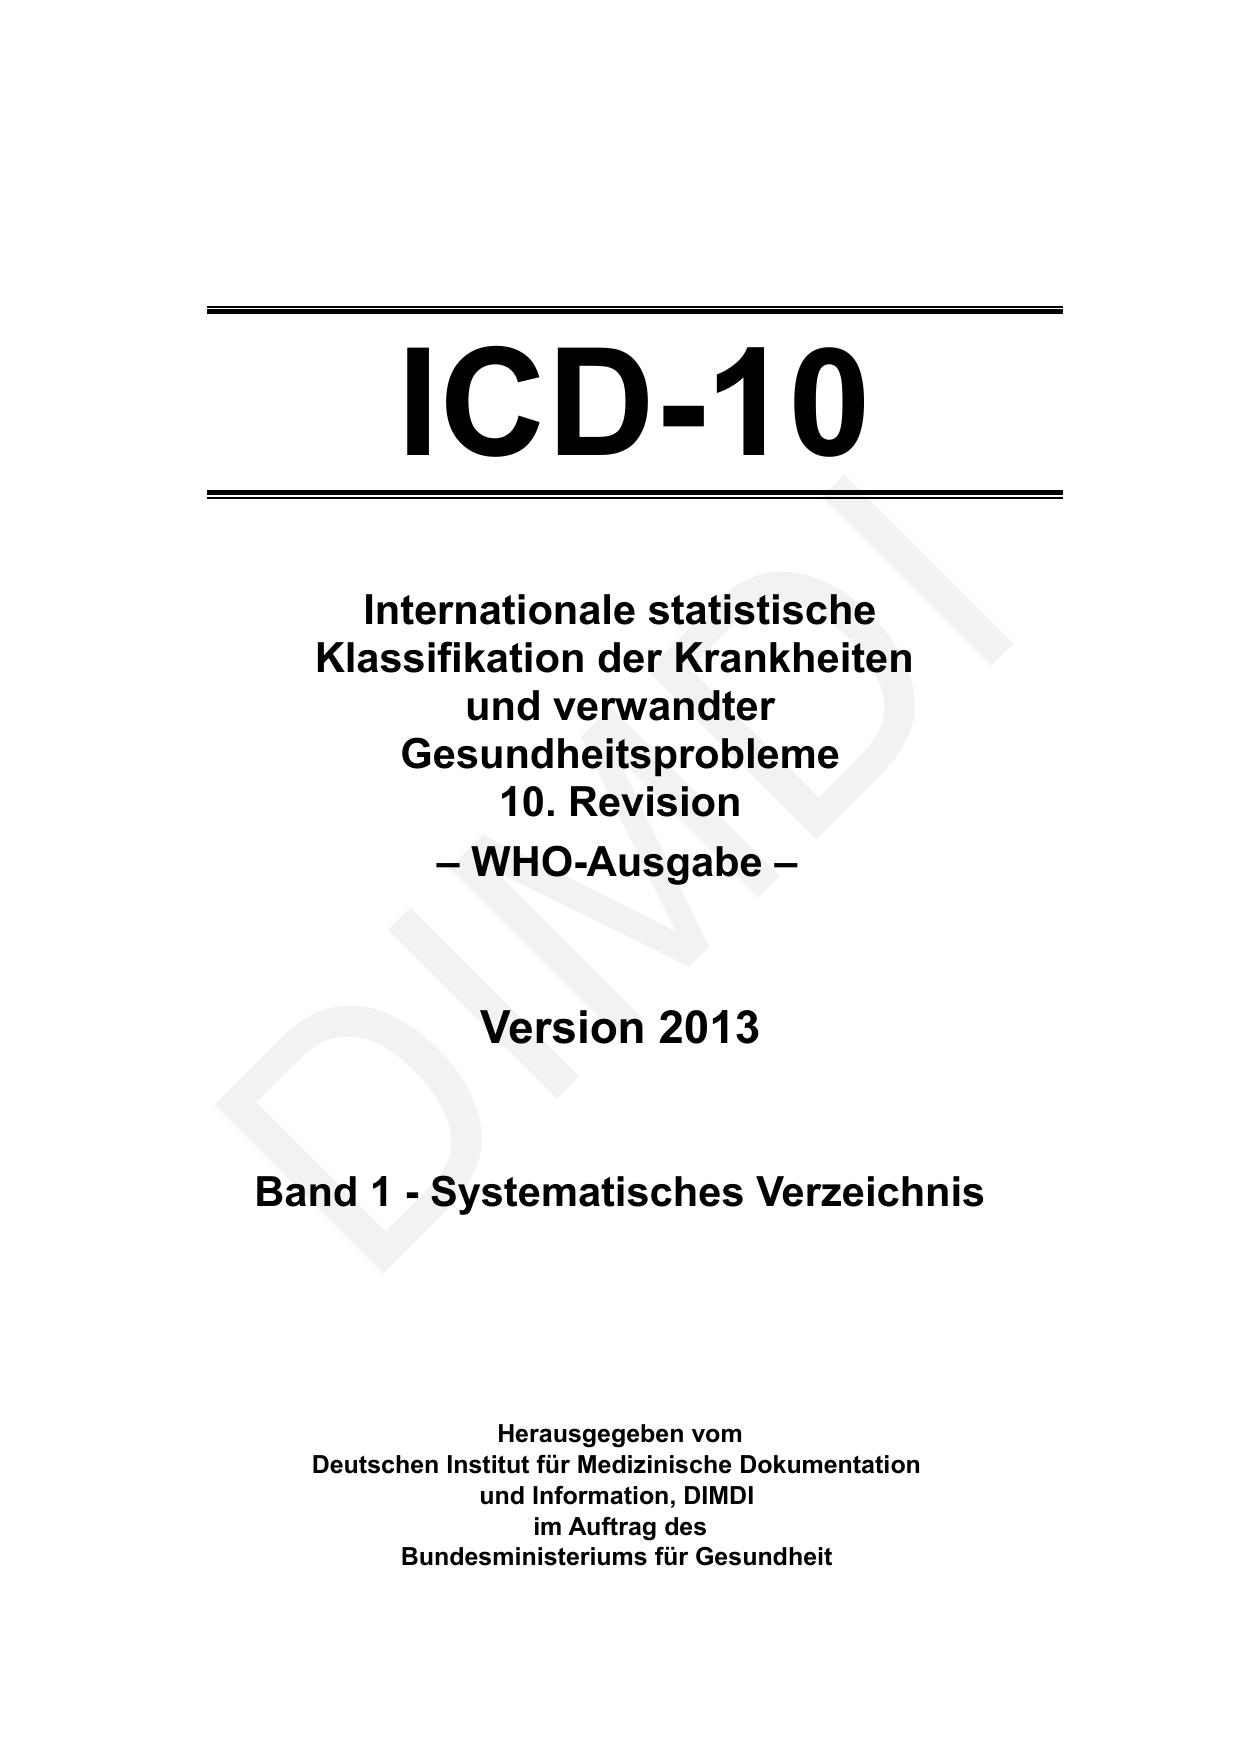 papilloma of uvula icd 10